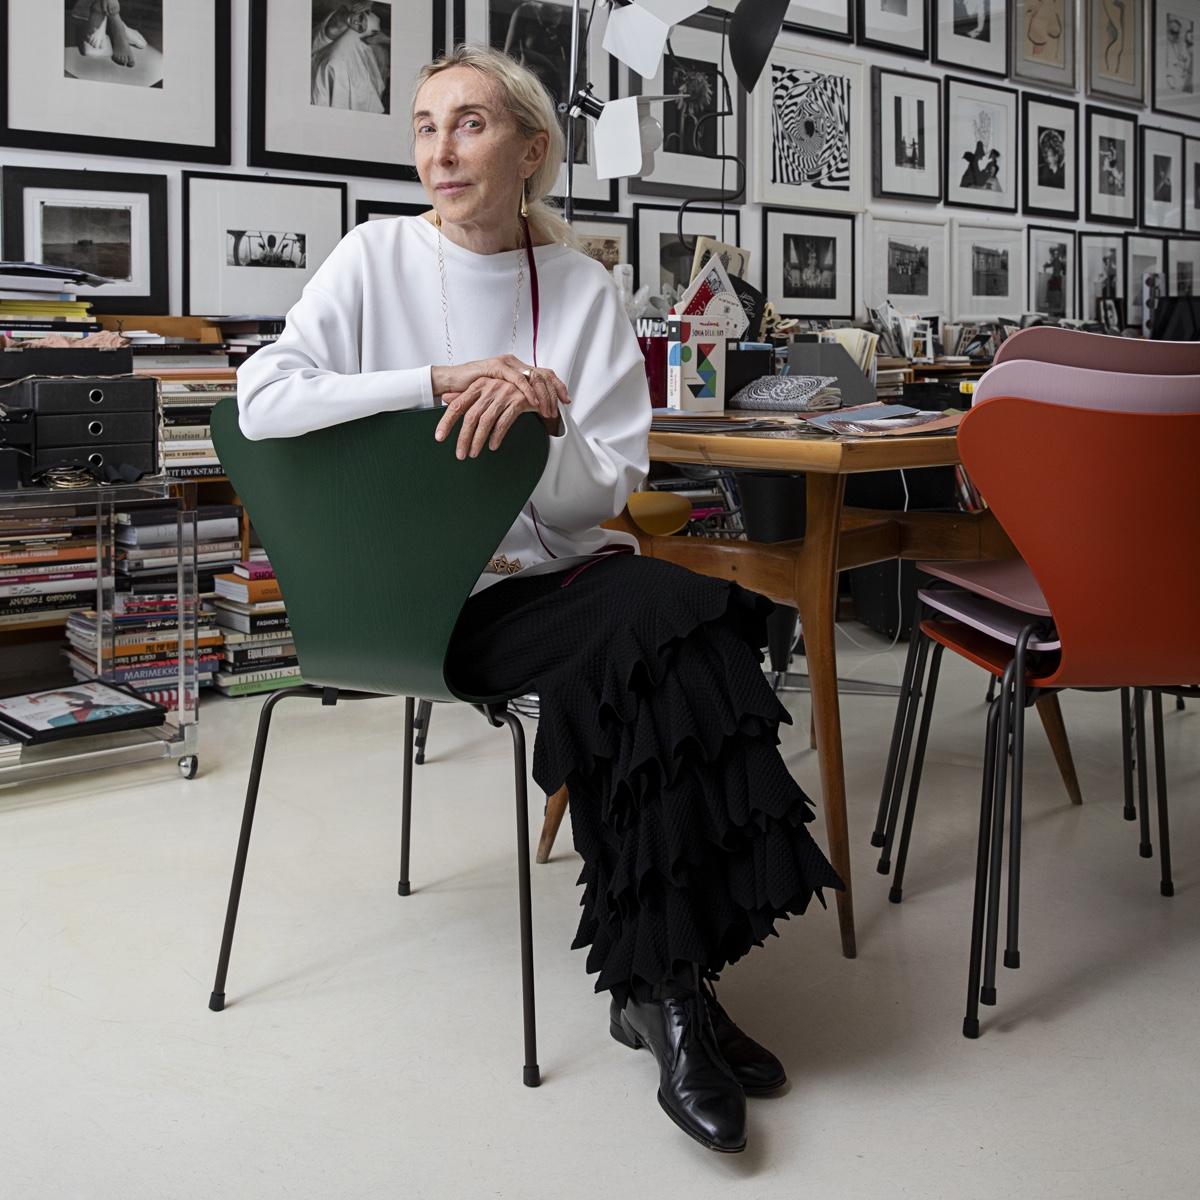 Carla Sozzani in her studio sitting on a fritz hansen series 7 chair